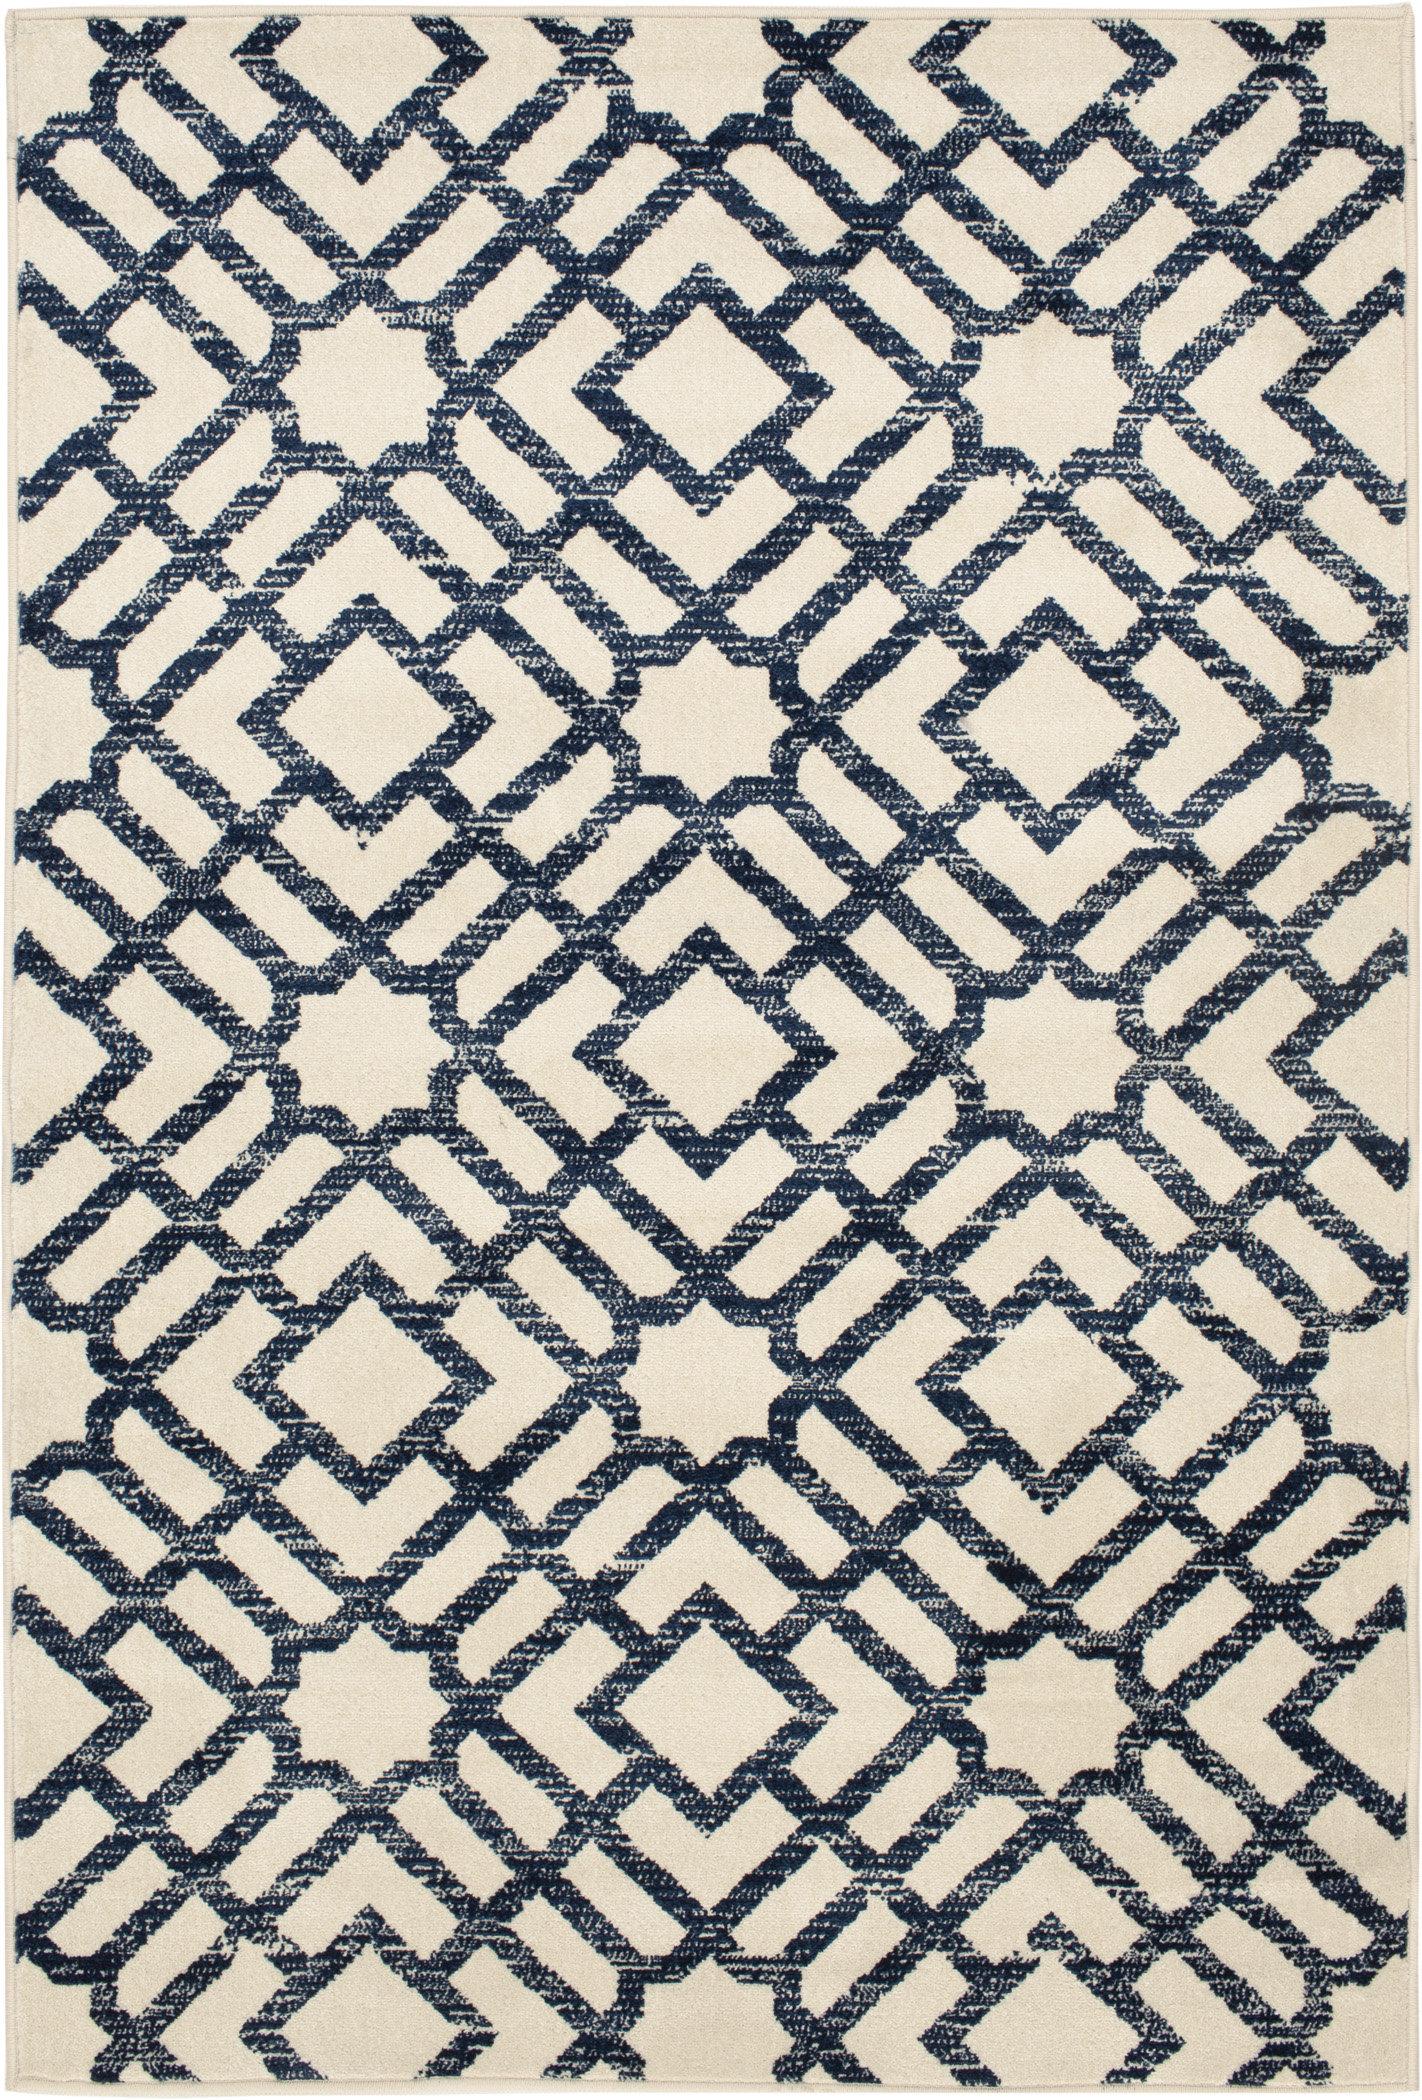 Trisha Yearwood Home Collection Renew Newell Geometric Snow Sapphire Indoor Outdoor Area Rug Wayfair